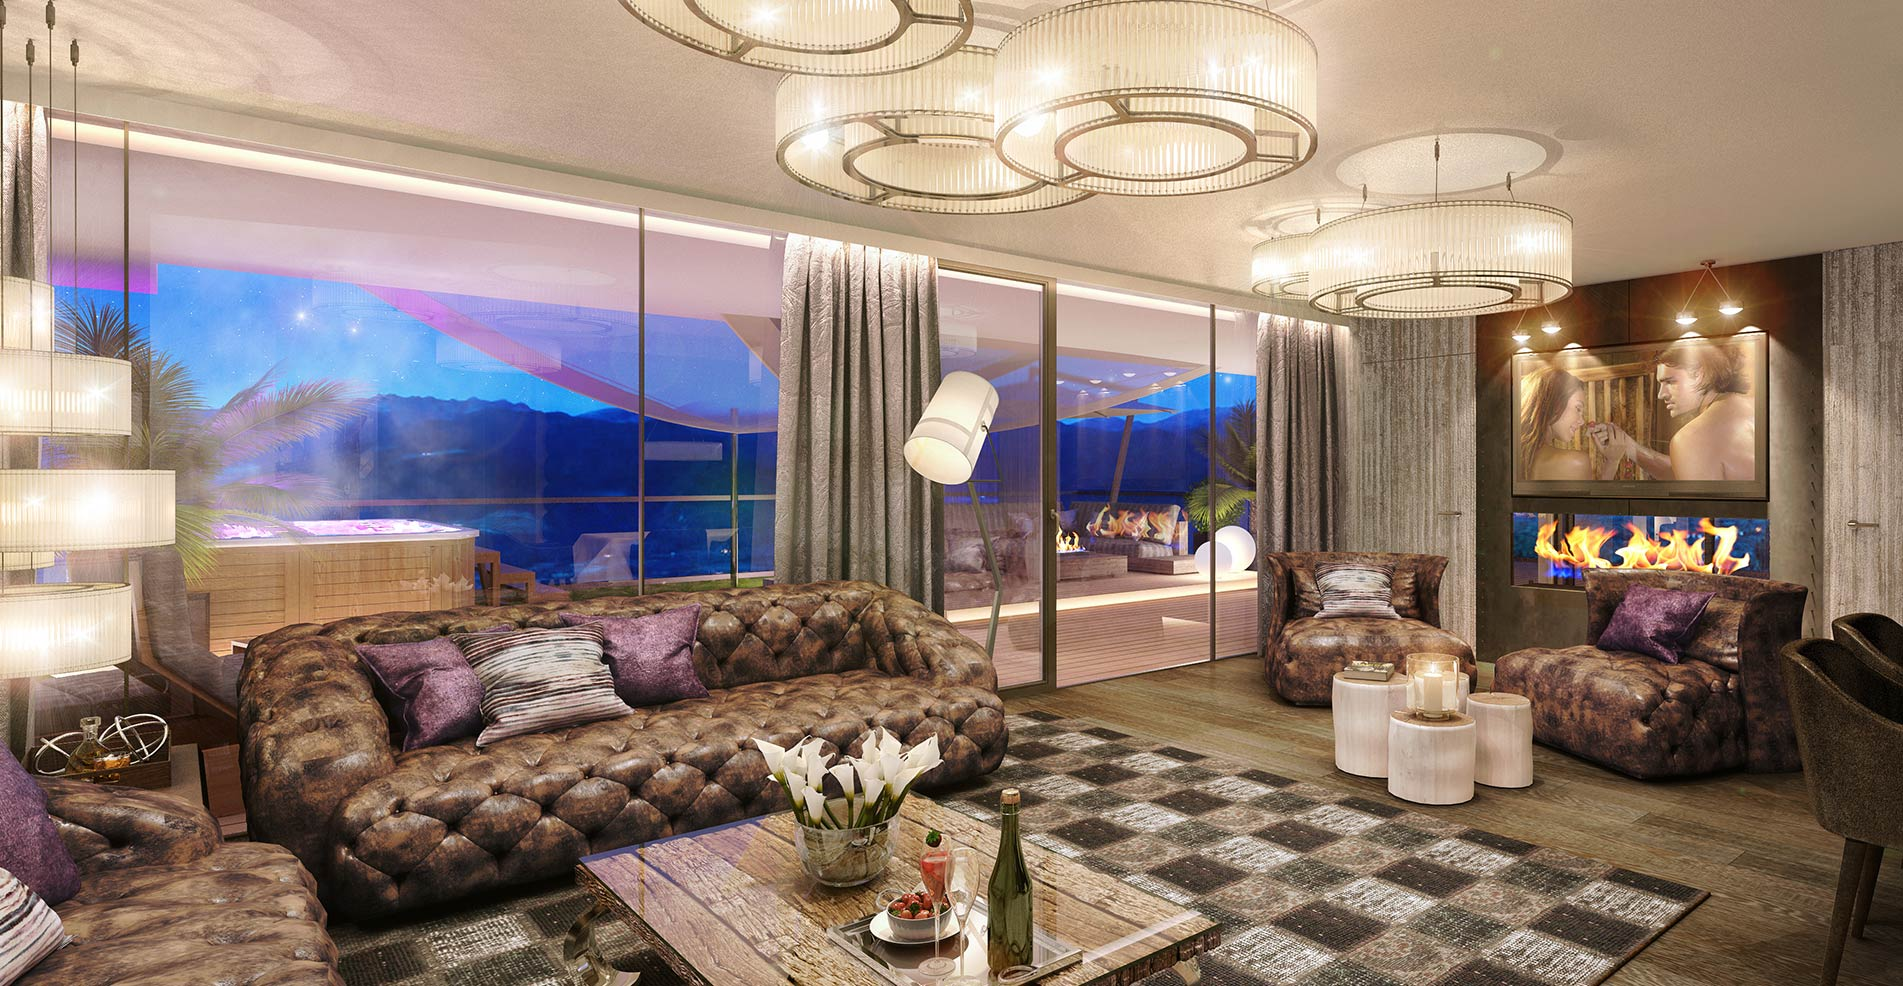 Wellnesshotel S Dtirol 5 Luxury Dolce Vita Hotel